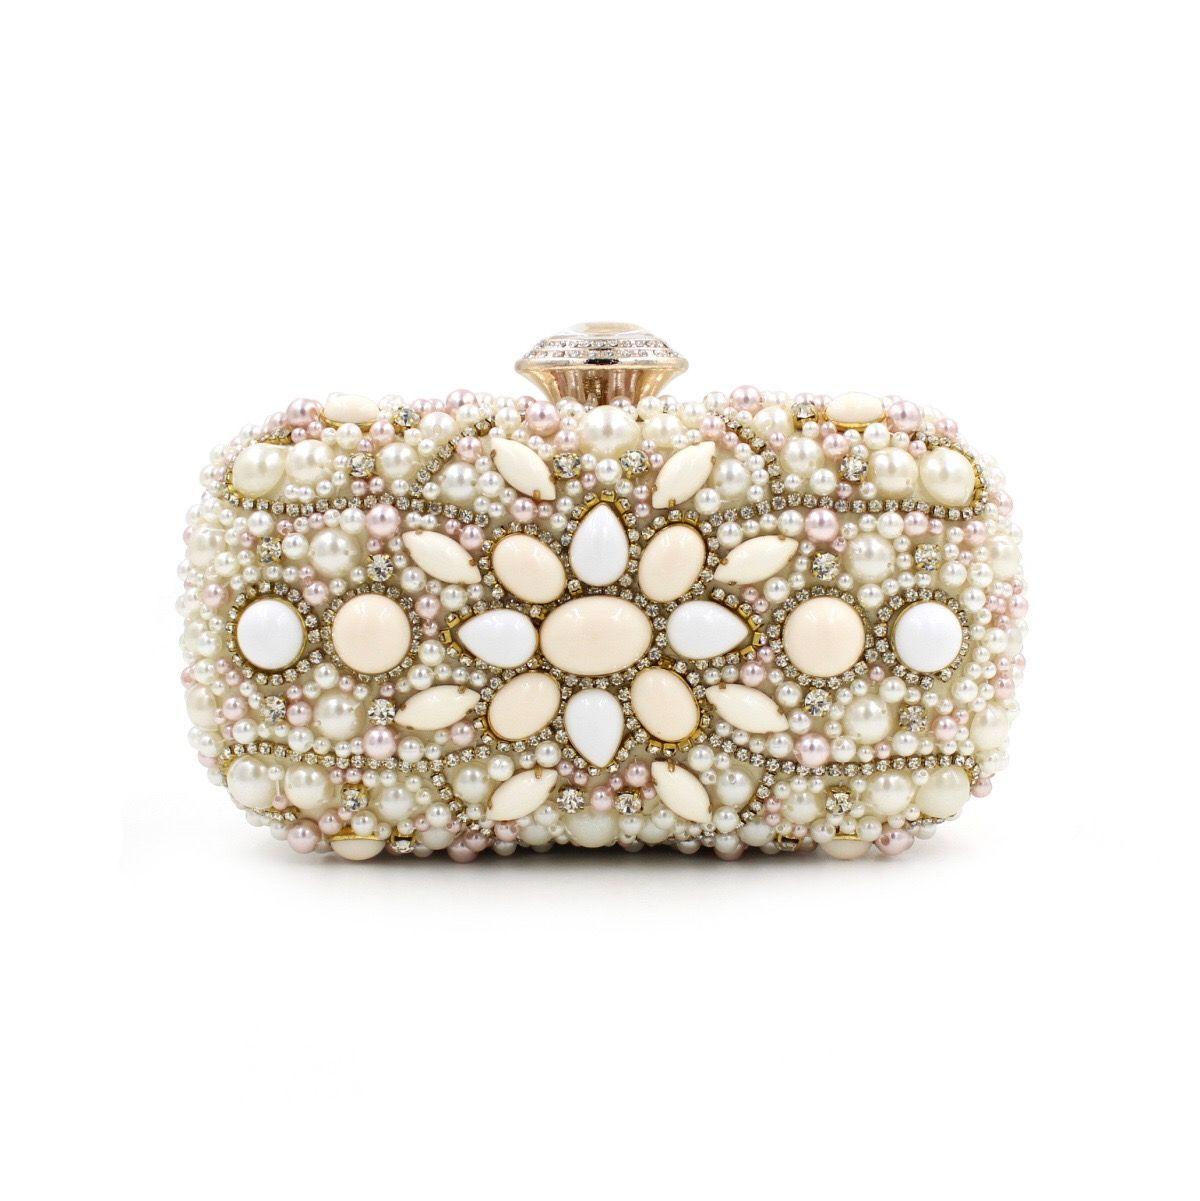 b41a752619 New Arrive Women Evening Bags Nude Stone Diamond Clutch Bag Lady S Banquet  Chain Handbag Luxury Day Clutch Female Nude Fashion Handbags Large Handbags  From ...